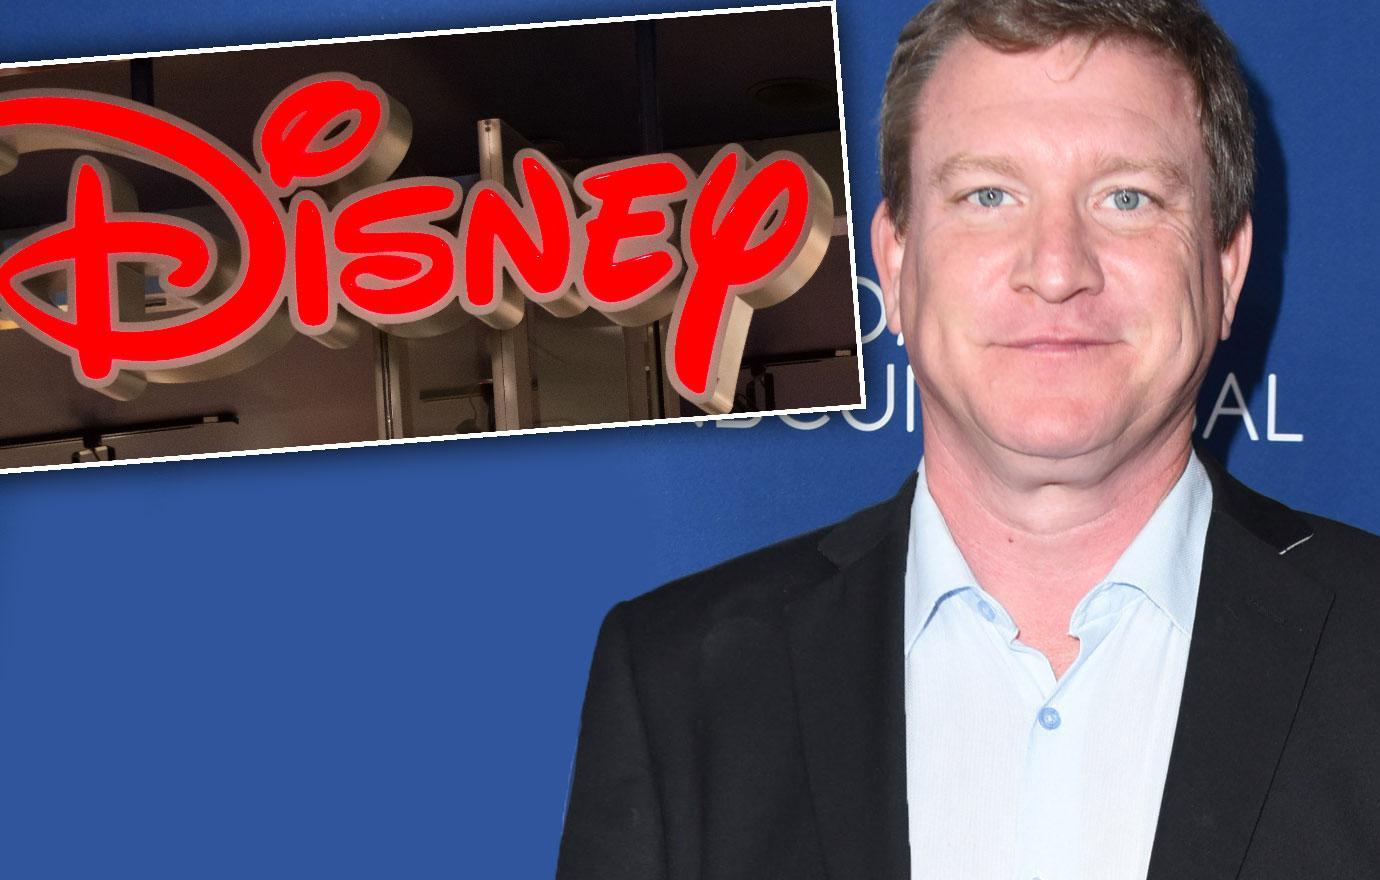 Disney Actor Stoney Westmoreland Fired After Teen Sex Arrest